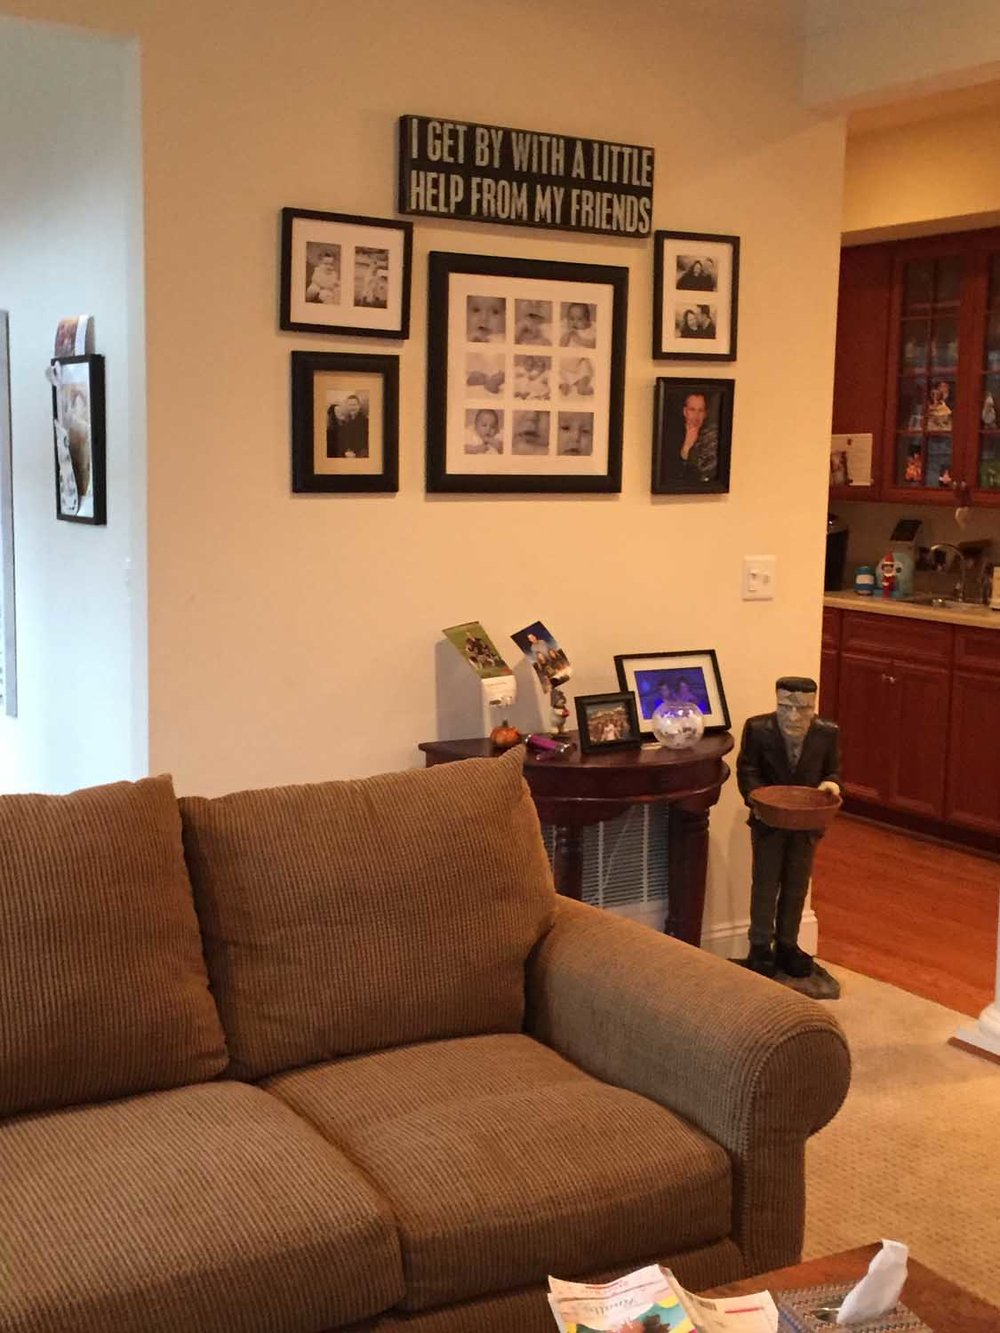 Howard County Maryland Family Room Update Photo Wall Before – Designer Bestie April Force Pardoe Interiors.jpg